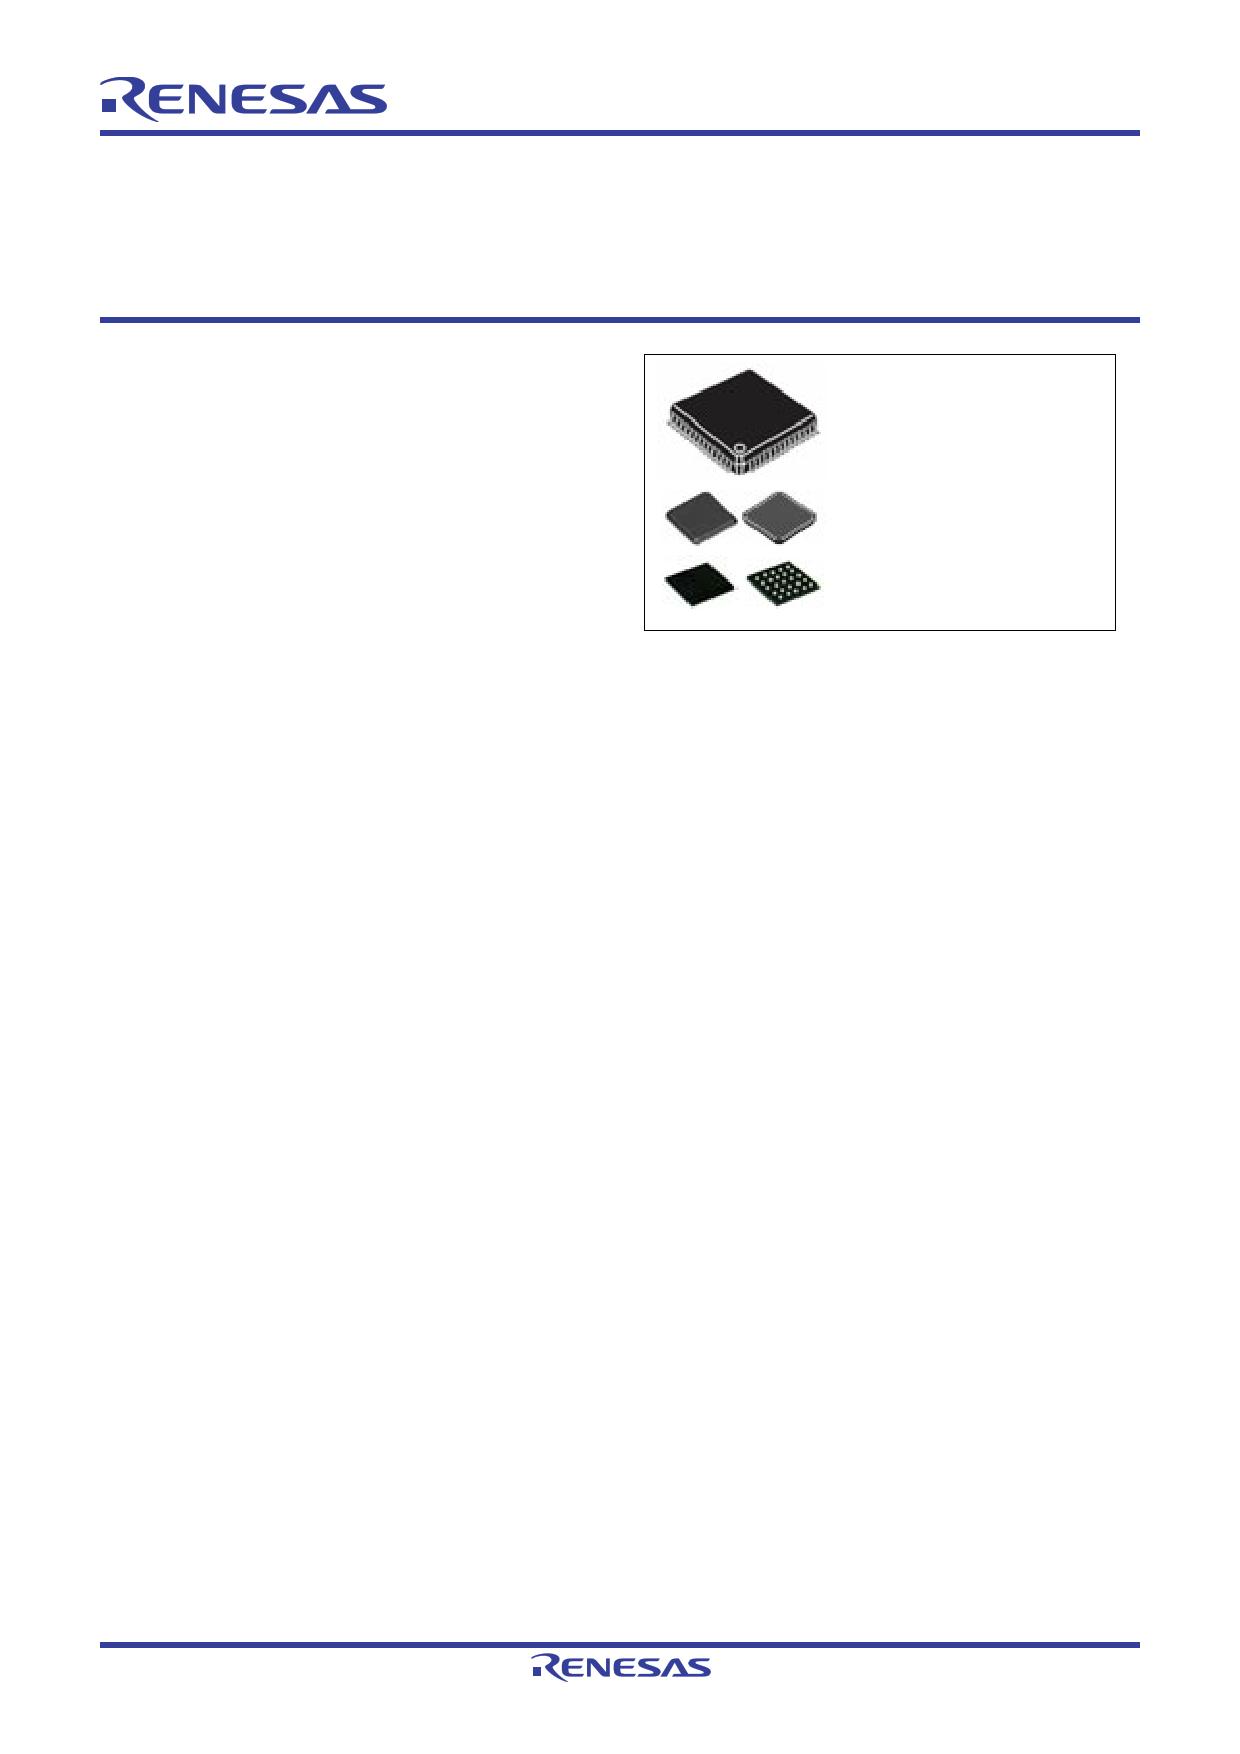 R5F51101ADFK 데이터시트 및 R5F51101ADFK PDF